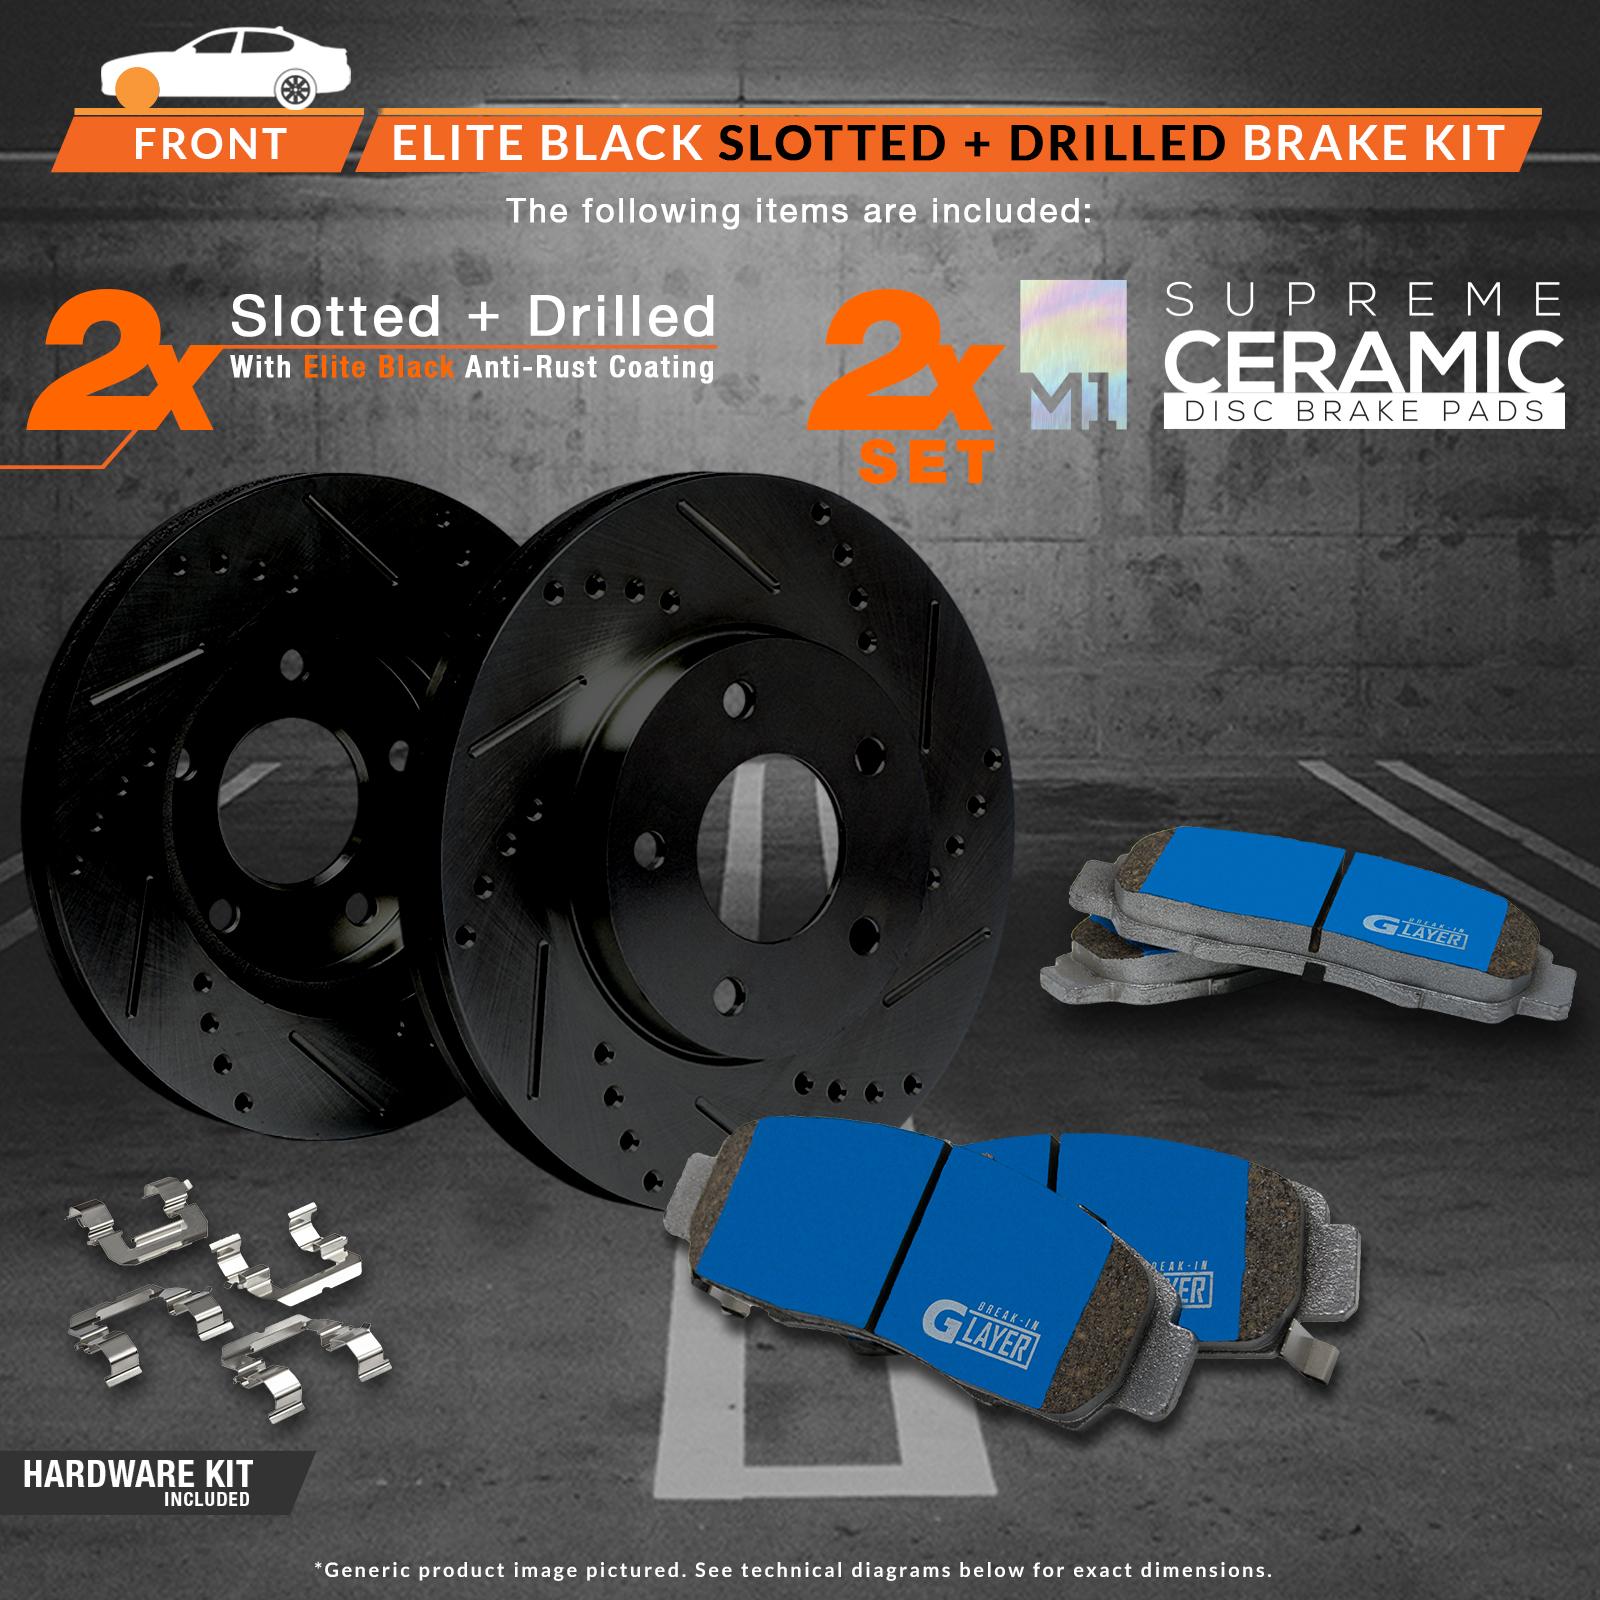 F-Rotors-w-M1-Ceramic-Pads-Elite-Brakes-2007-2008-2011-Fit-Lexus-GS350-AWD thumbnail 2